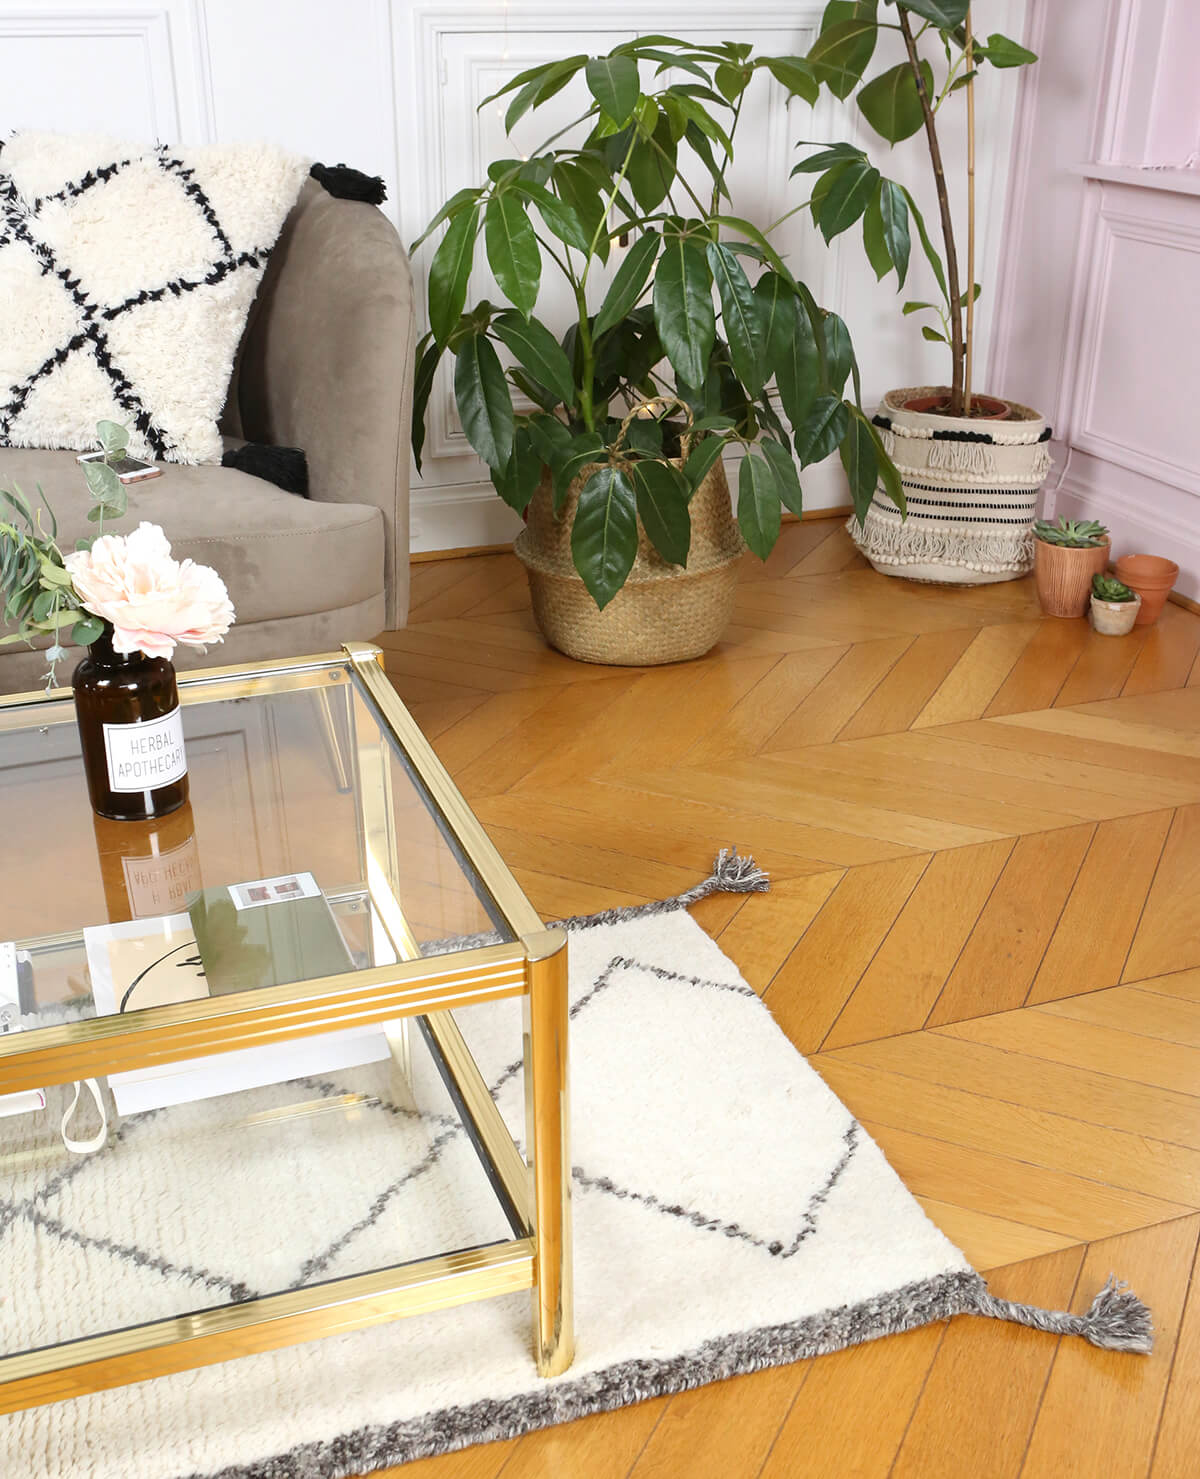 Le style bohème s'invite chez Pimkie Home - FrenchyFancy